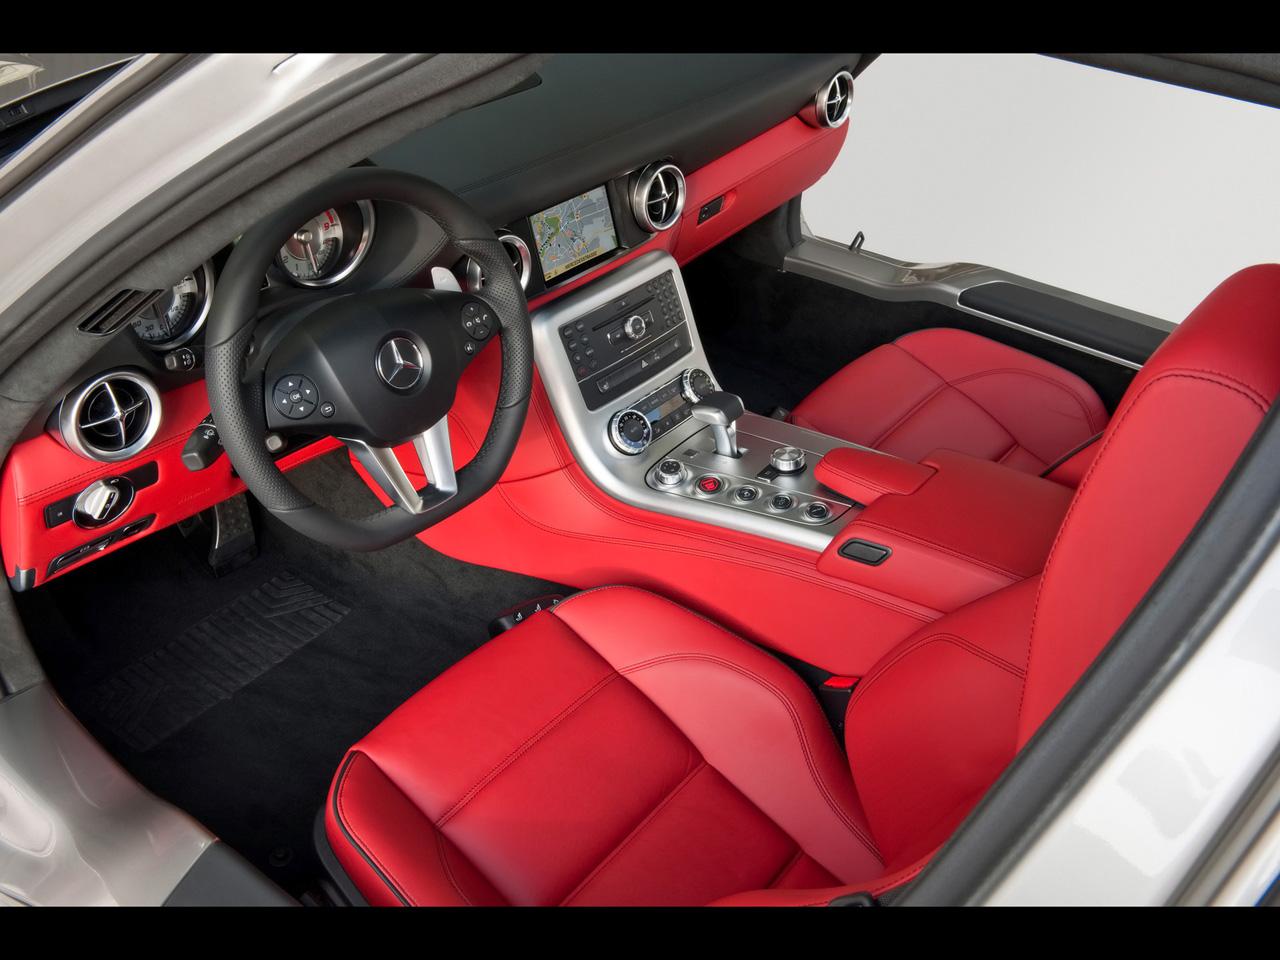 fast cars online mercedes benz sls amg interior - Mercedes Benz Sls Amg Interior